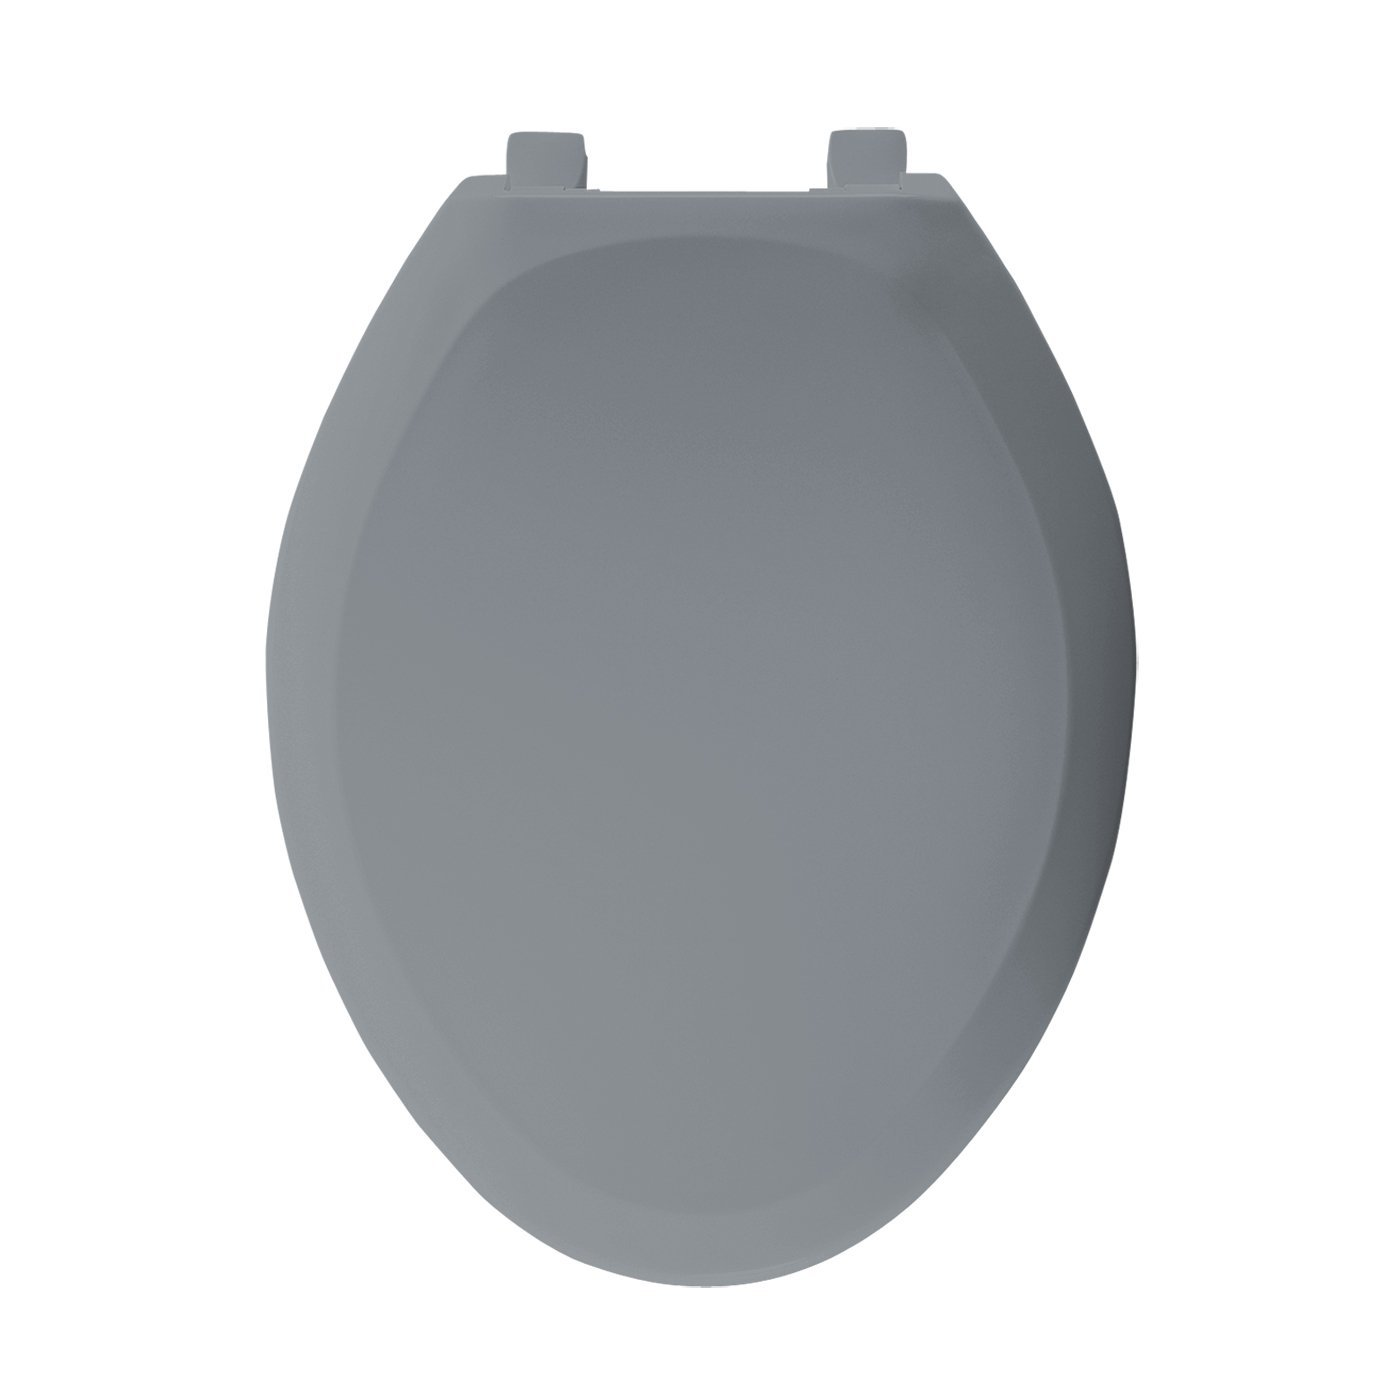 Church Bemis 1200TC032 Plastic Elongated Toilet Seat Country Grey